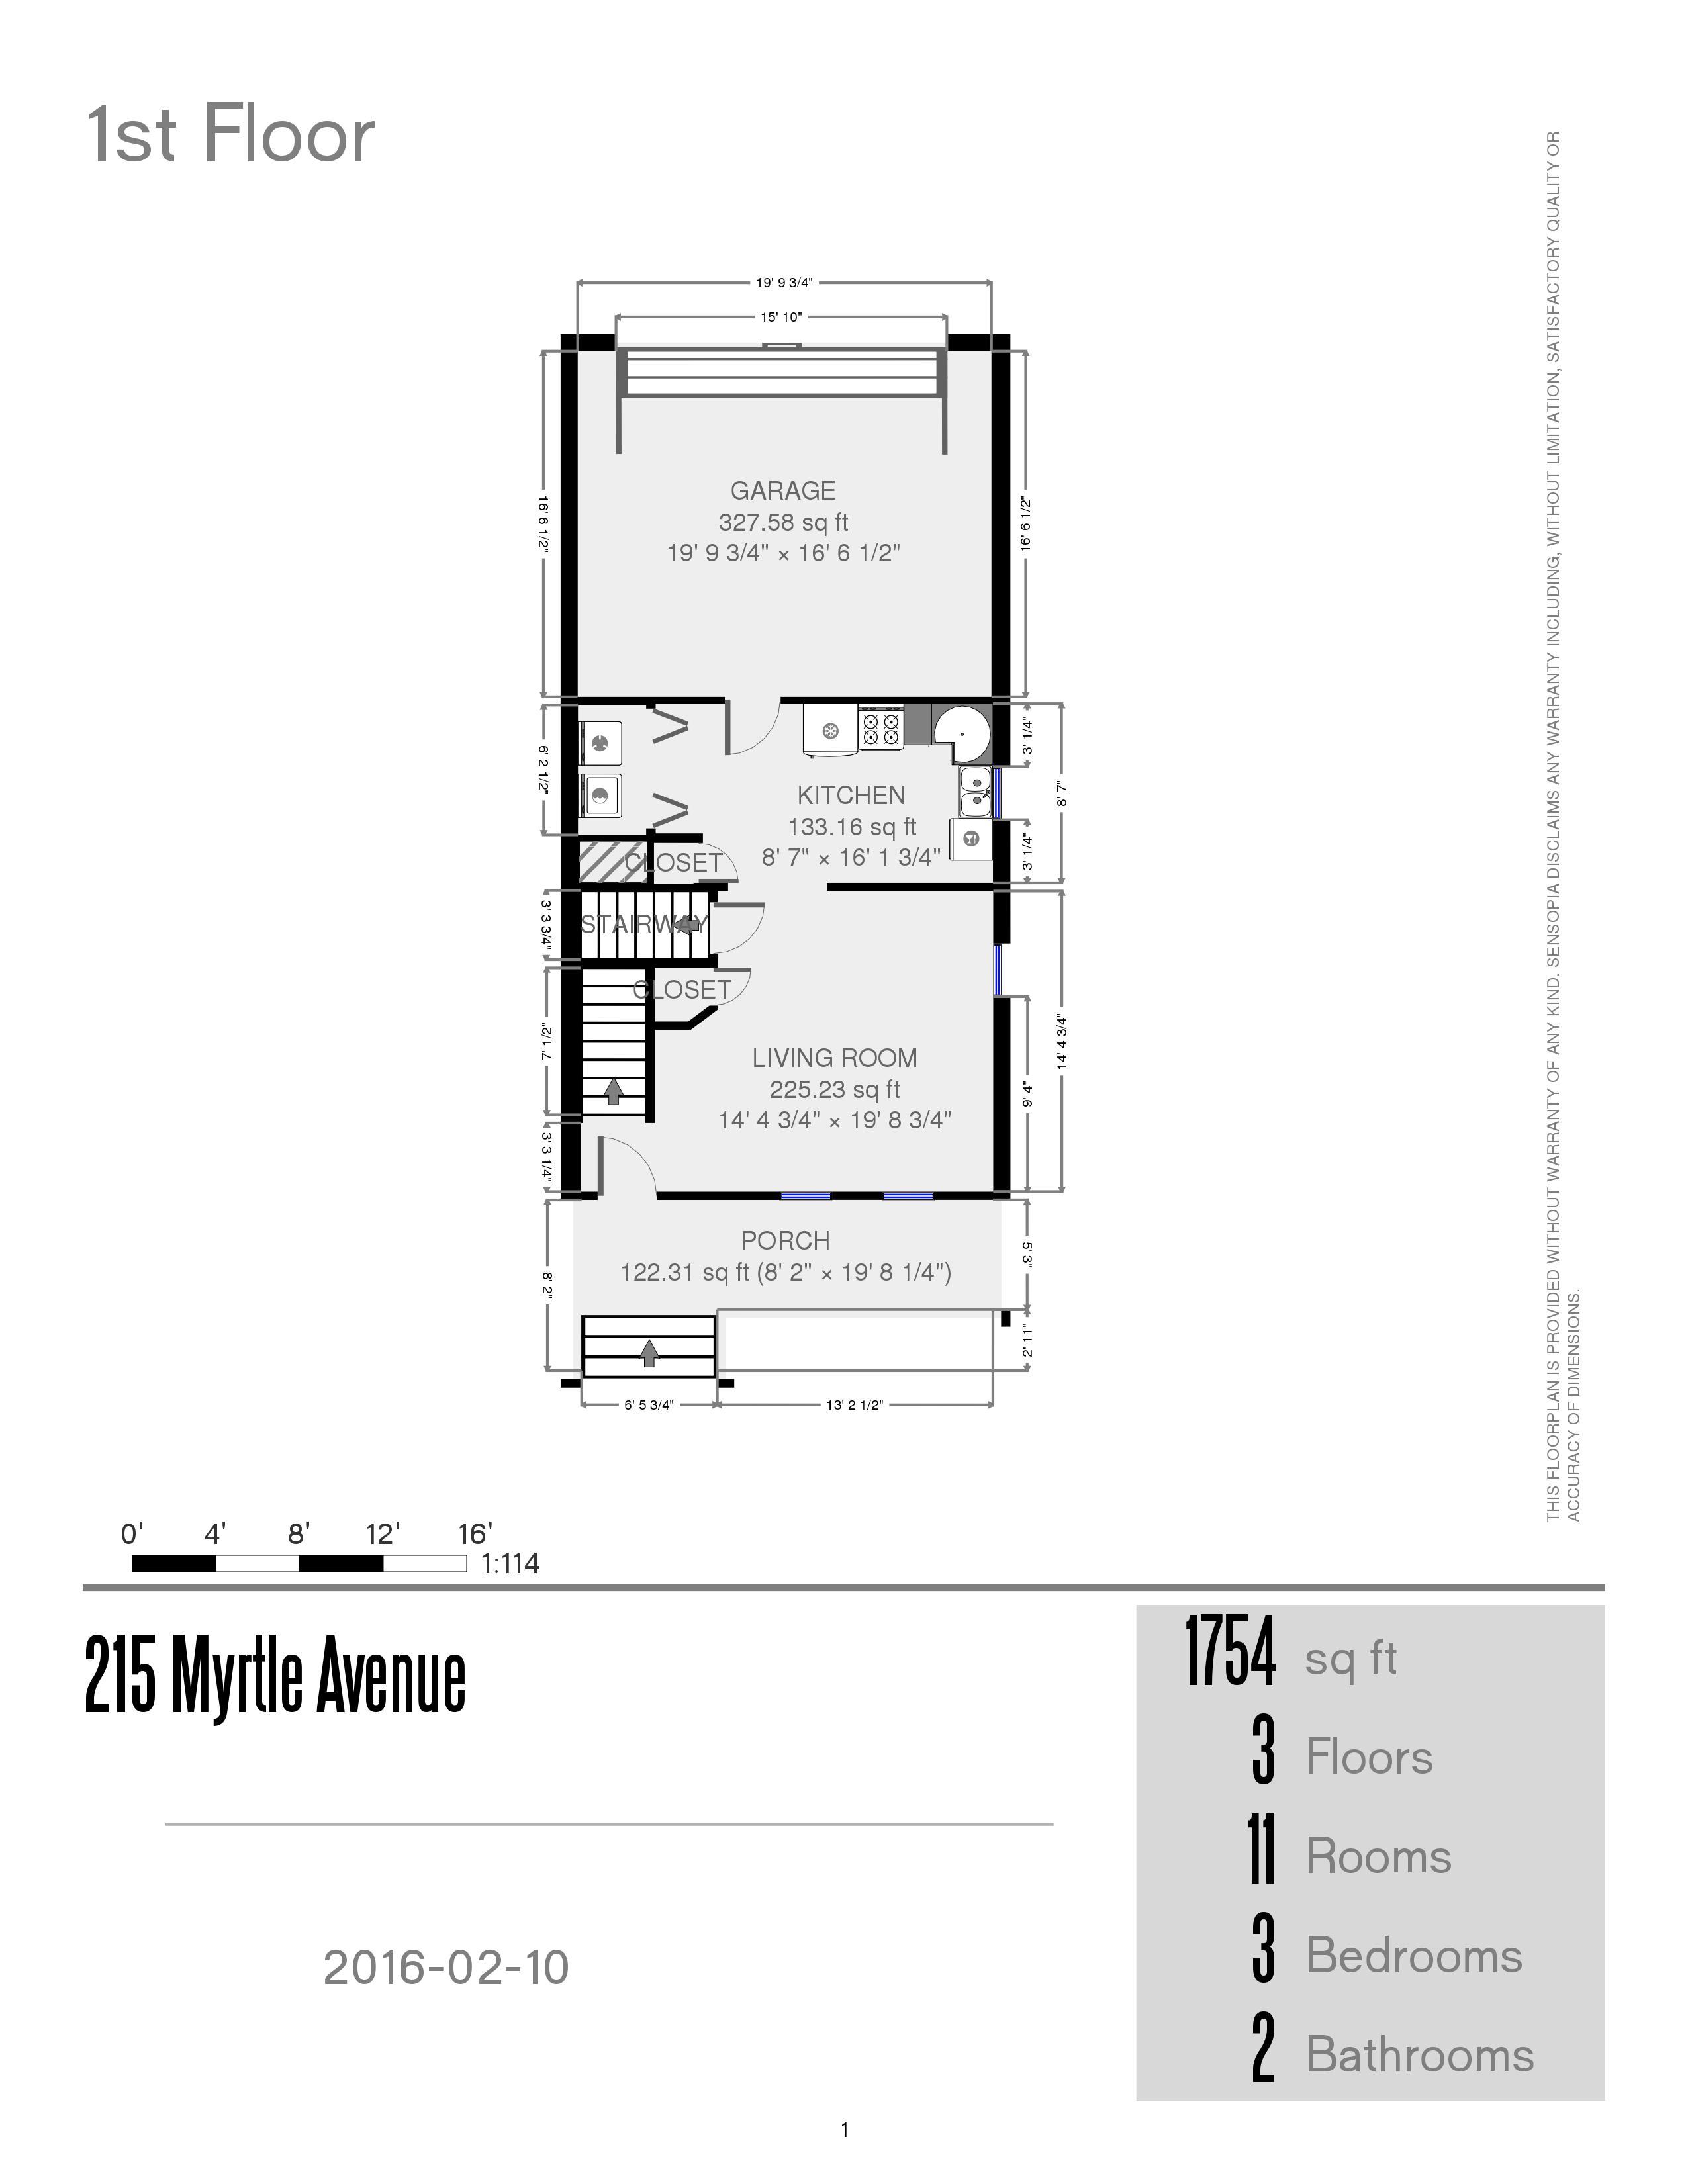 Prestige properties llc 215 myrtle ave duplex 3br 2ba for 3br 2ba floor plans